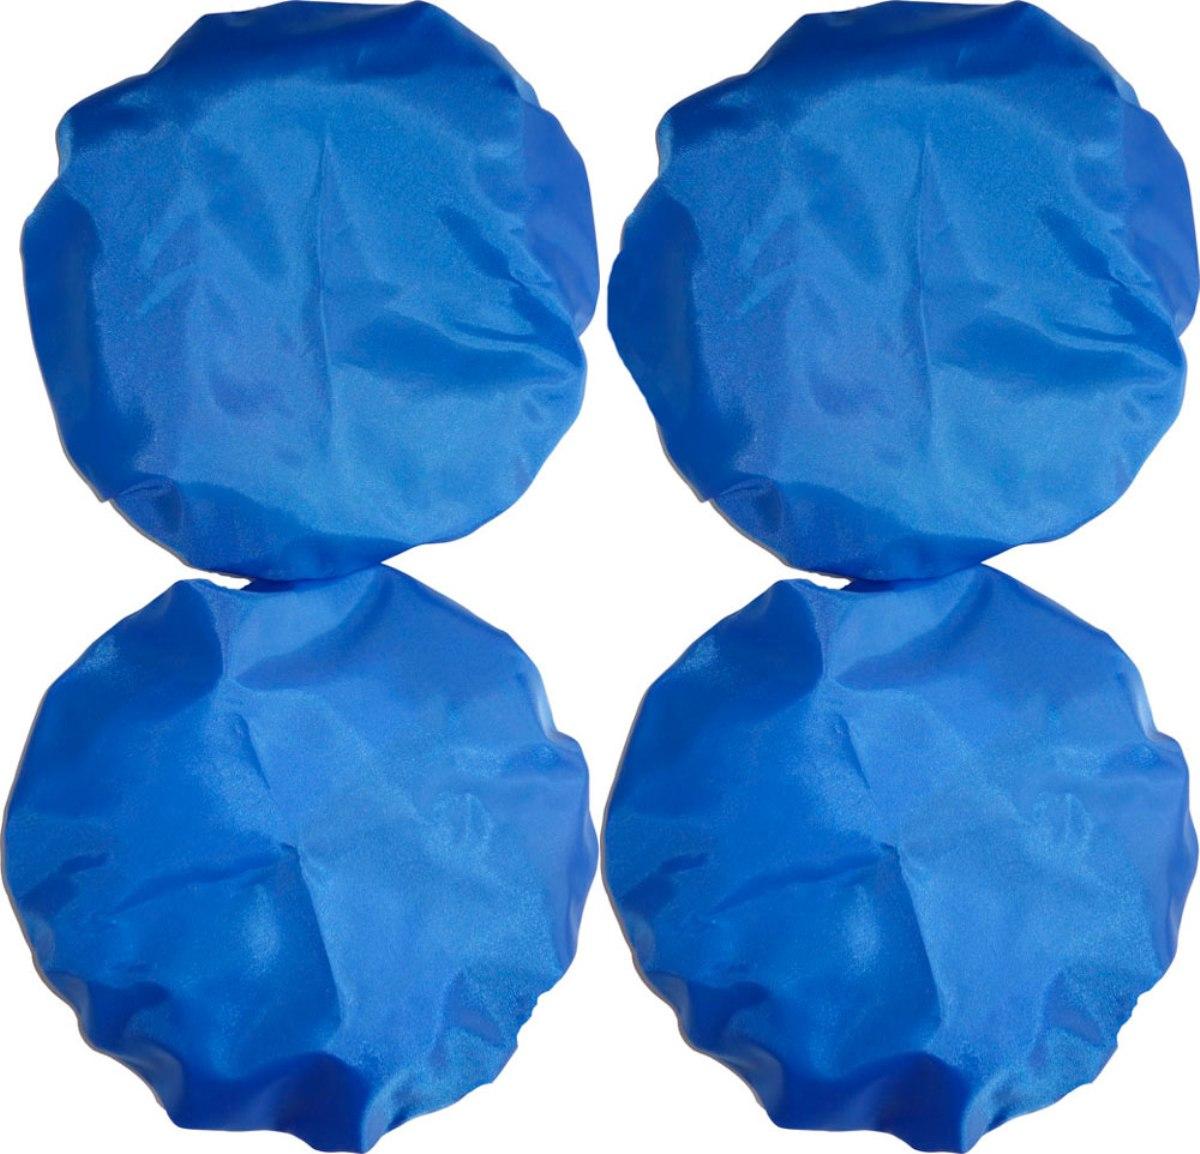 Чудо-Чадо Чехлы на колеса для коляски диаметр 18-28 см цвет синий 4 шт